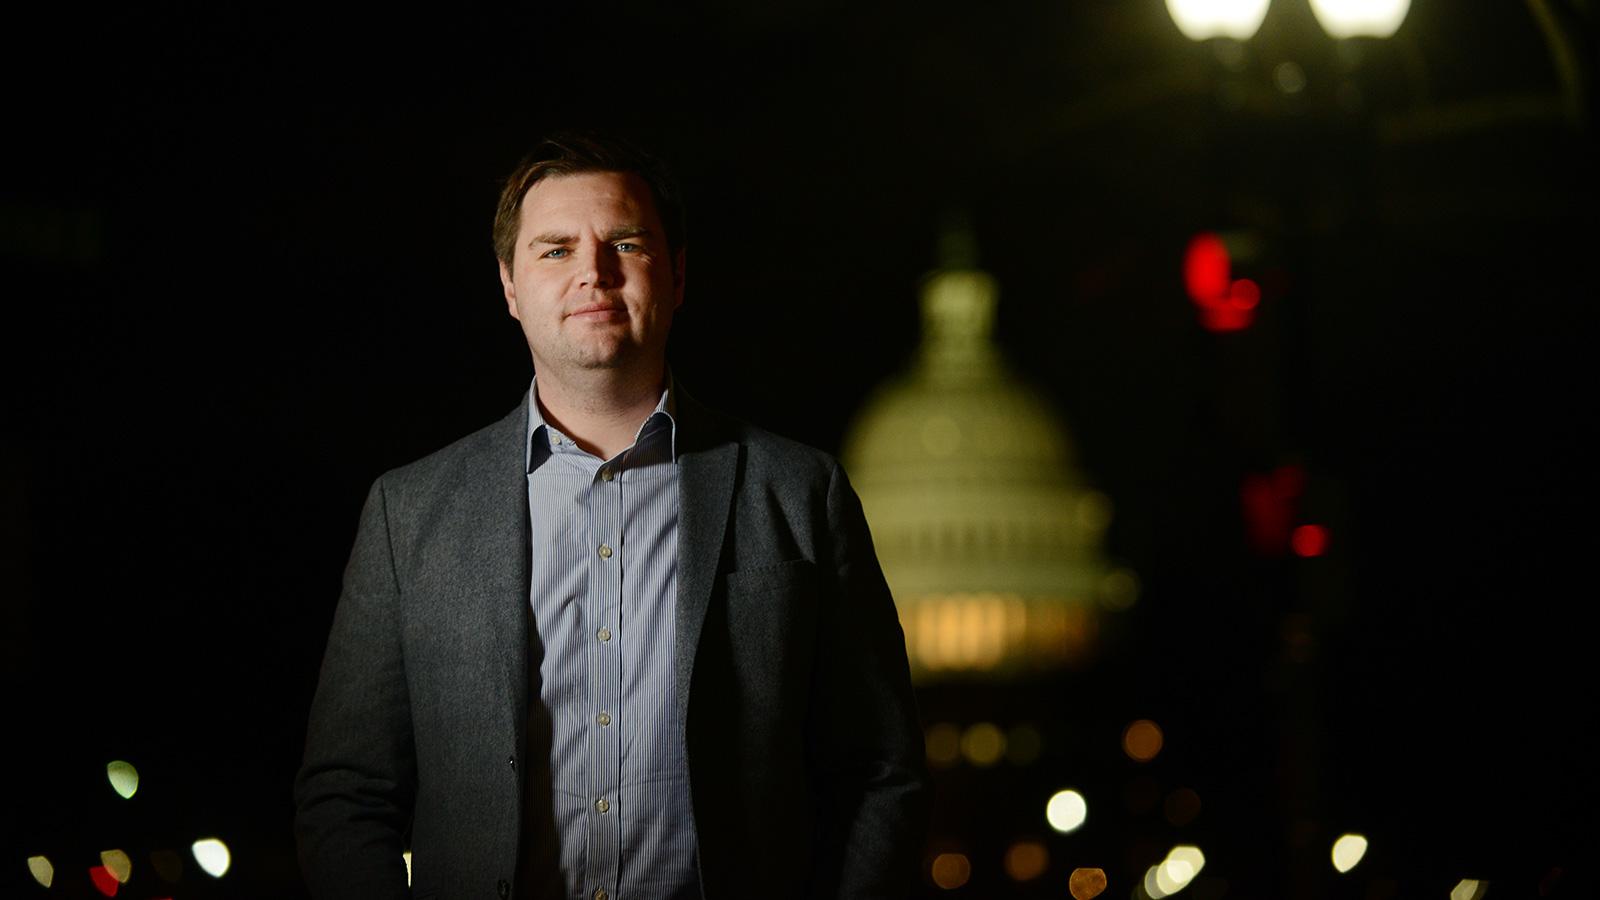 Hillbilly Elegy author enters large, pro-Trump GOP field for Ohio Senate seat